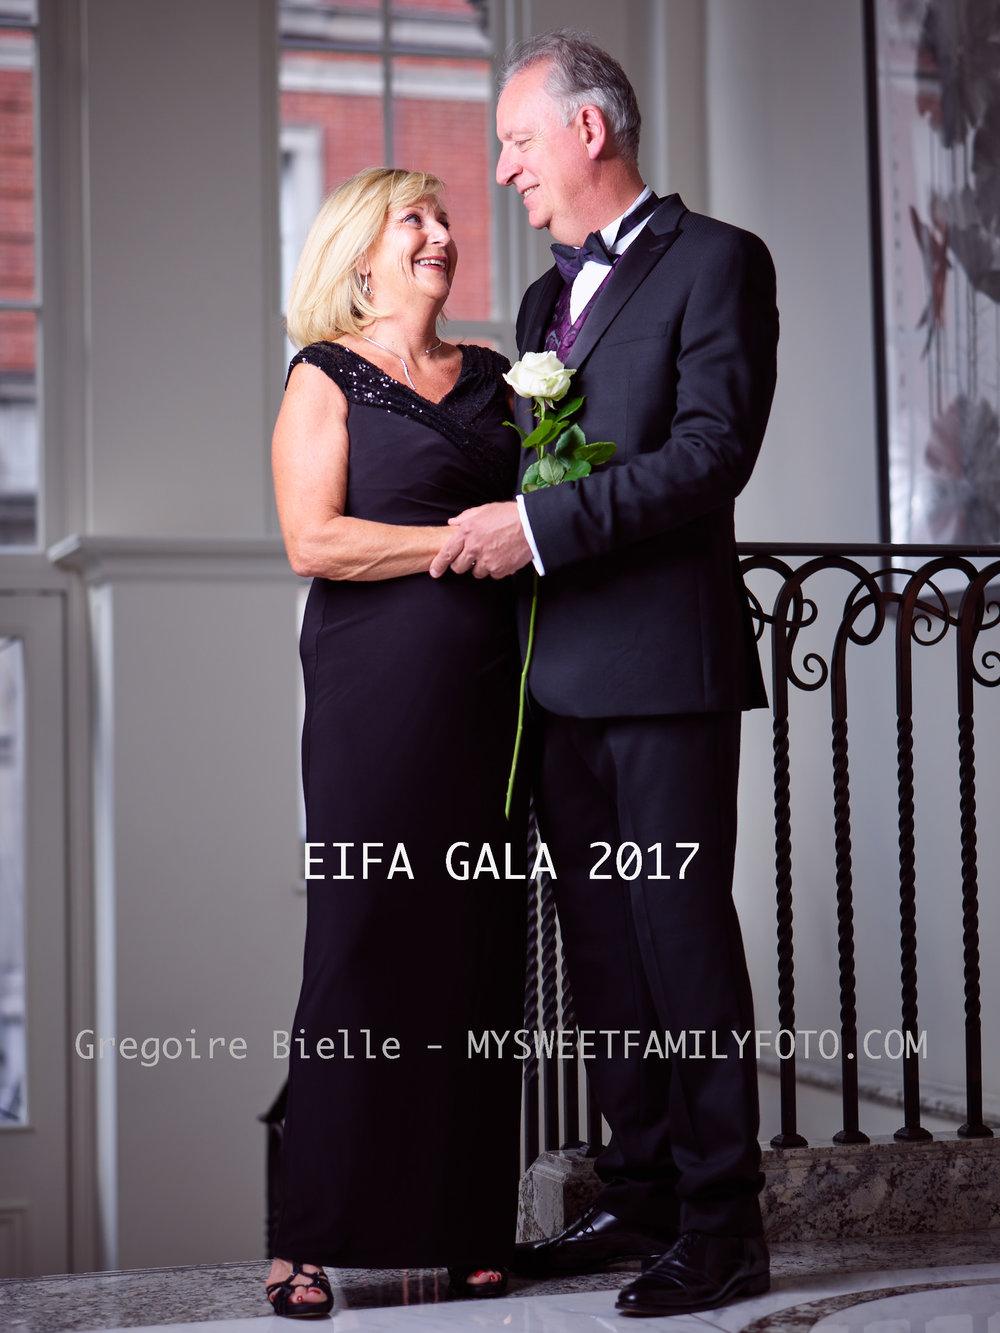 EIFA GALA 1002.jpg